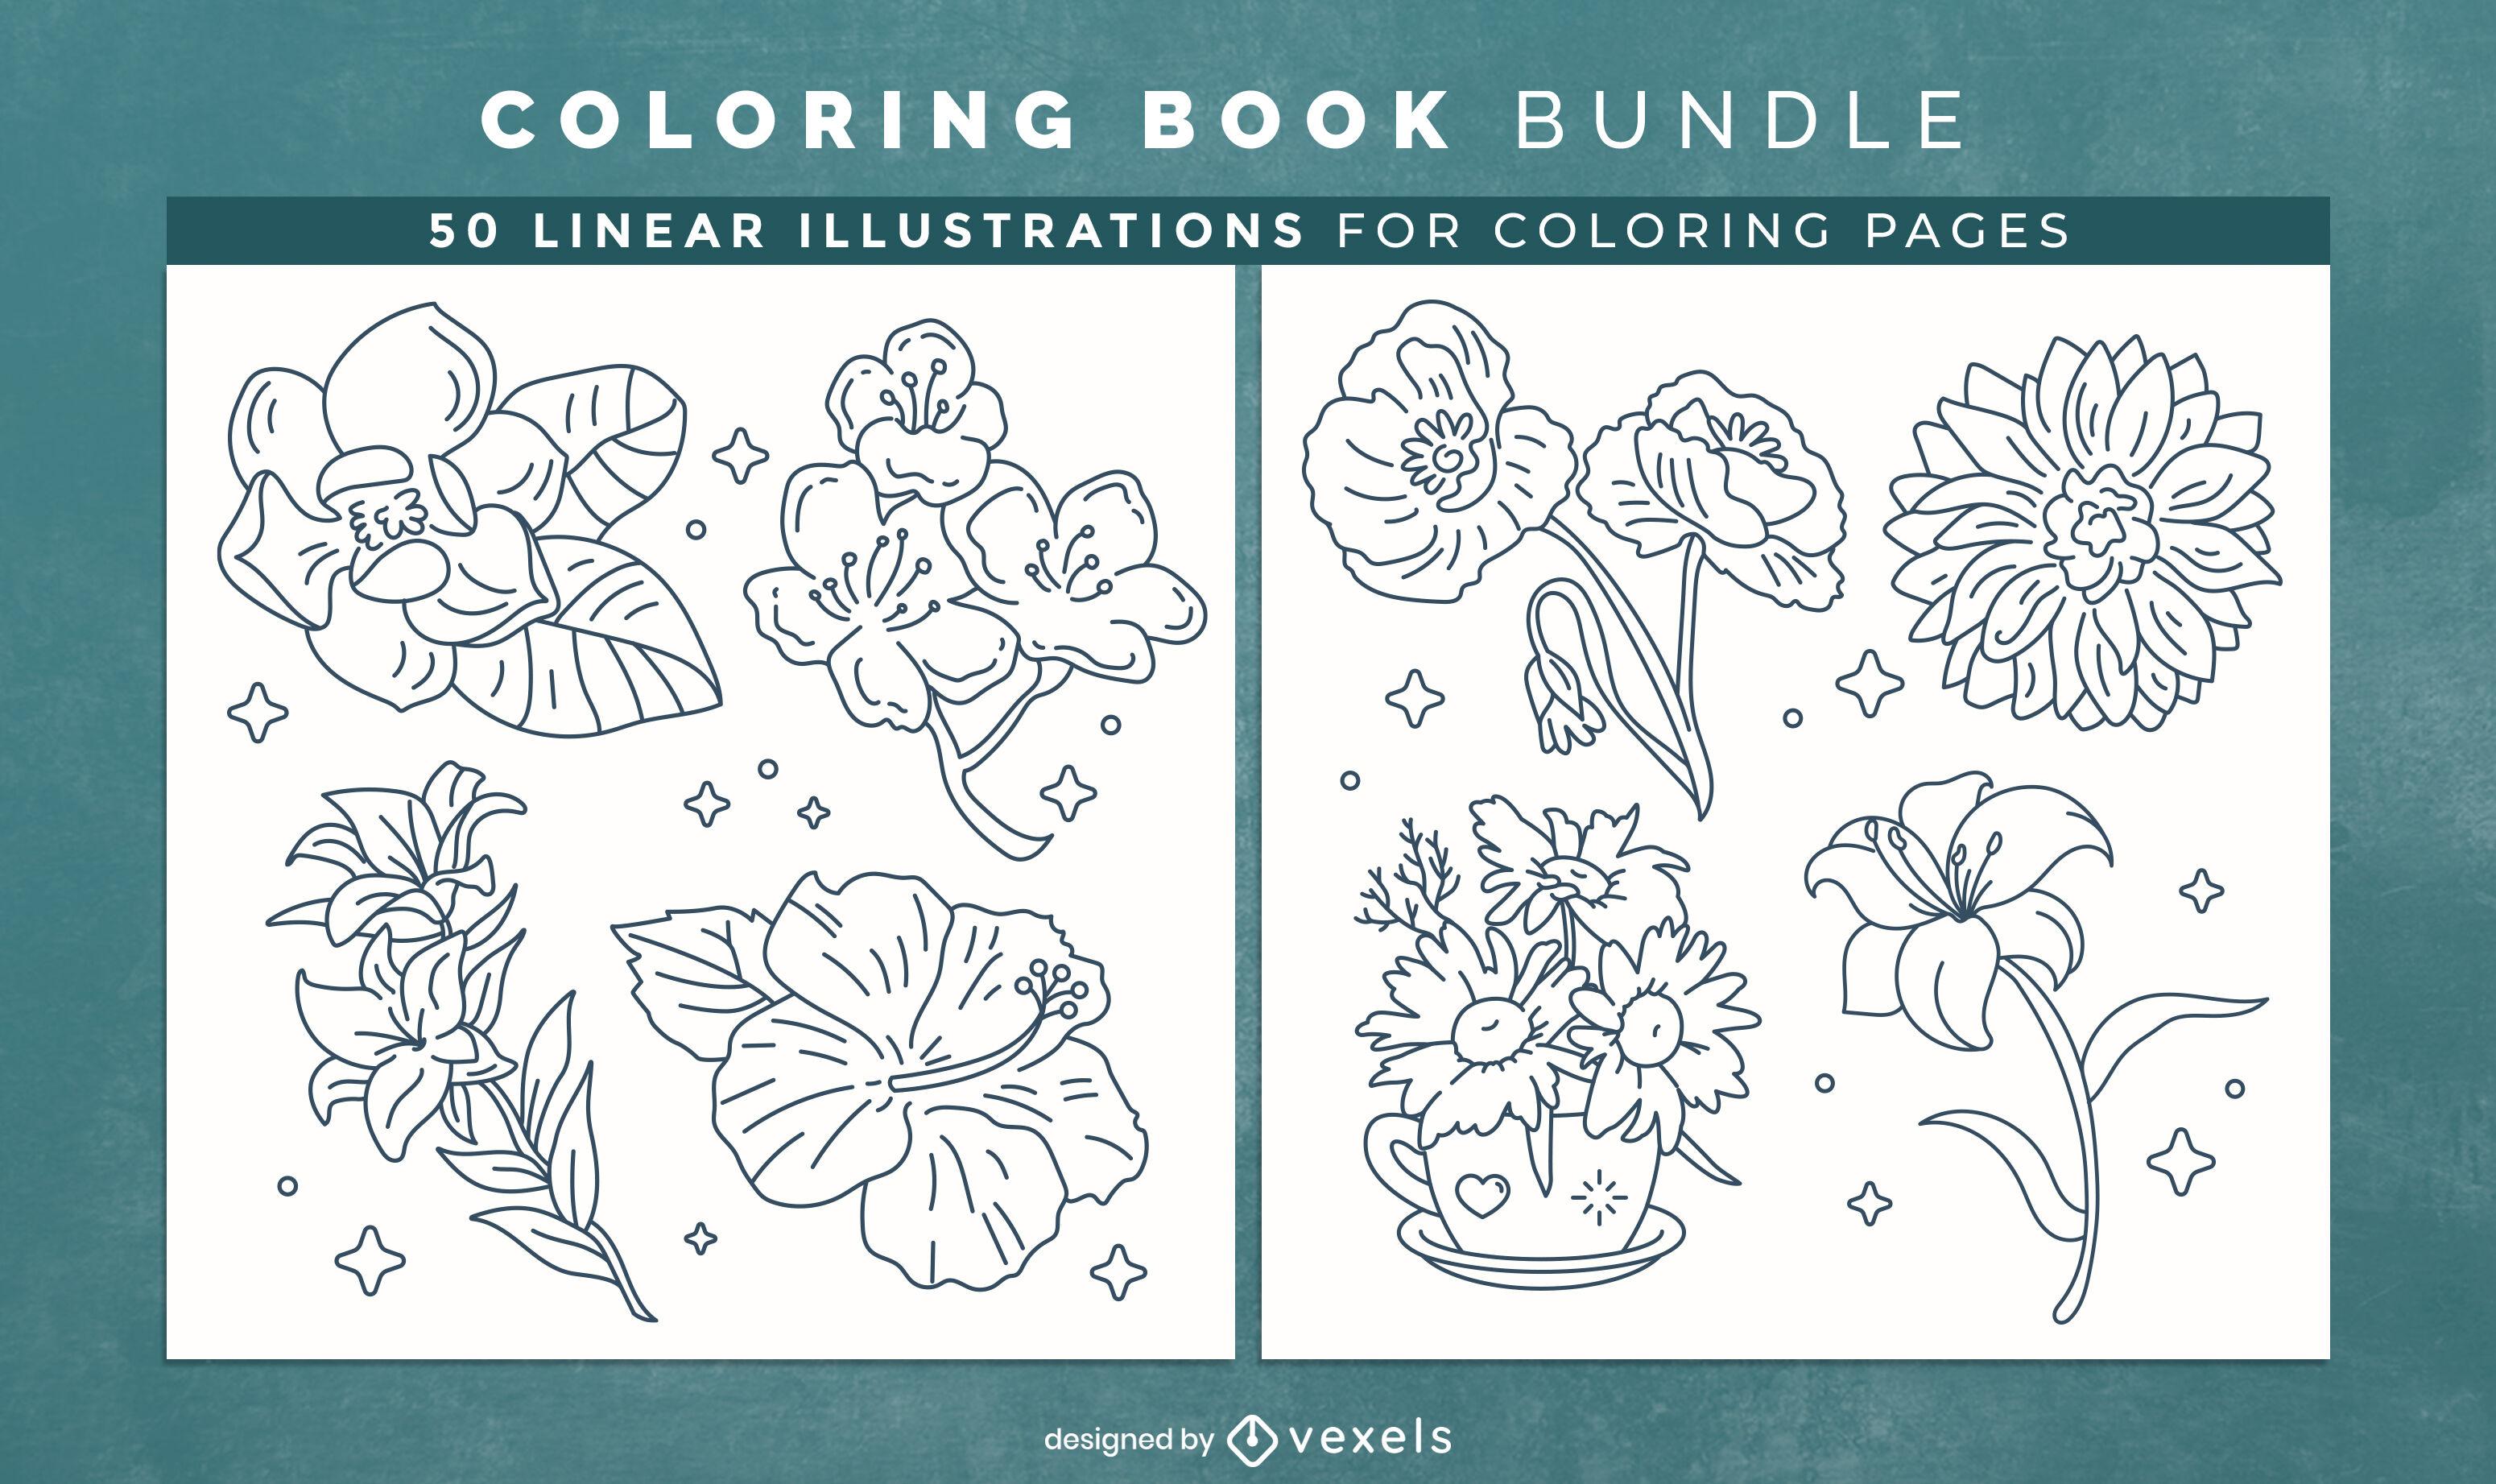 Flores para colorir livro KDP design de interiores